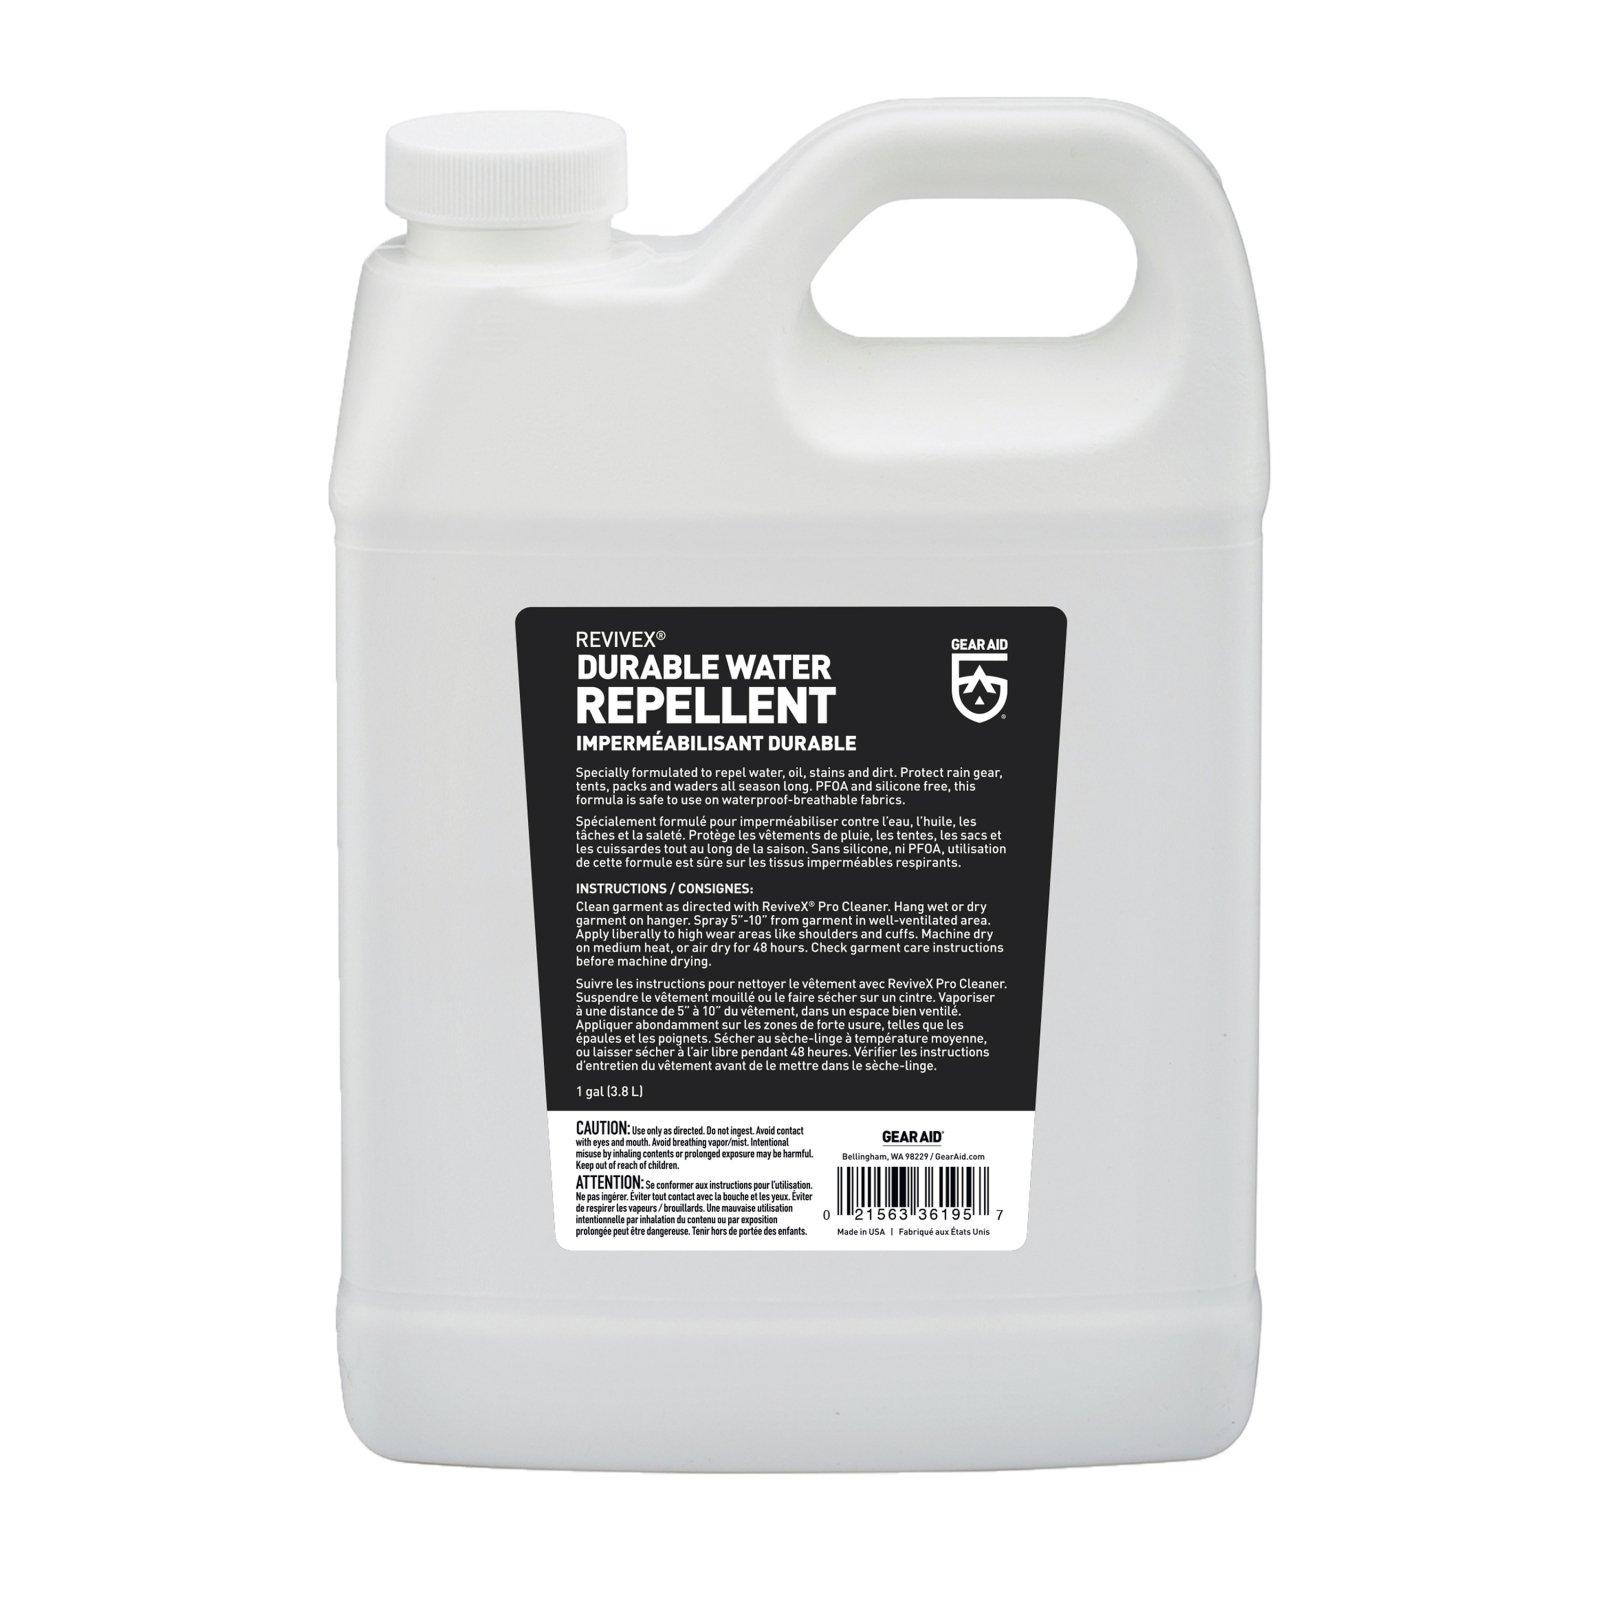 Gear Aid Revivex Durable Water Repellent Solution Raingear Waterproof 1 Gallon